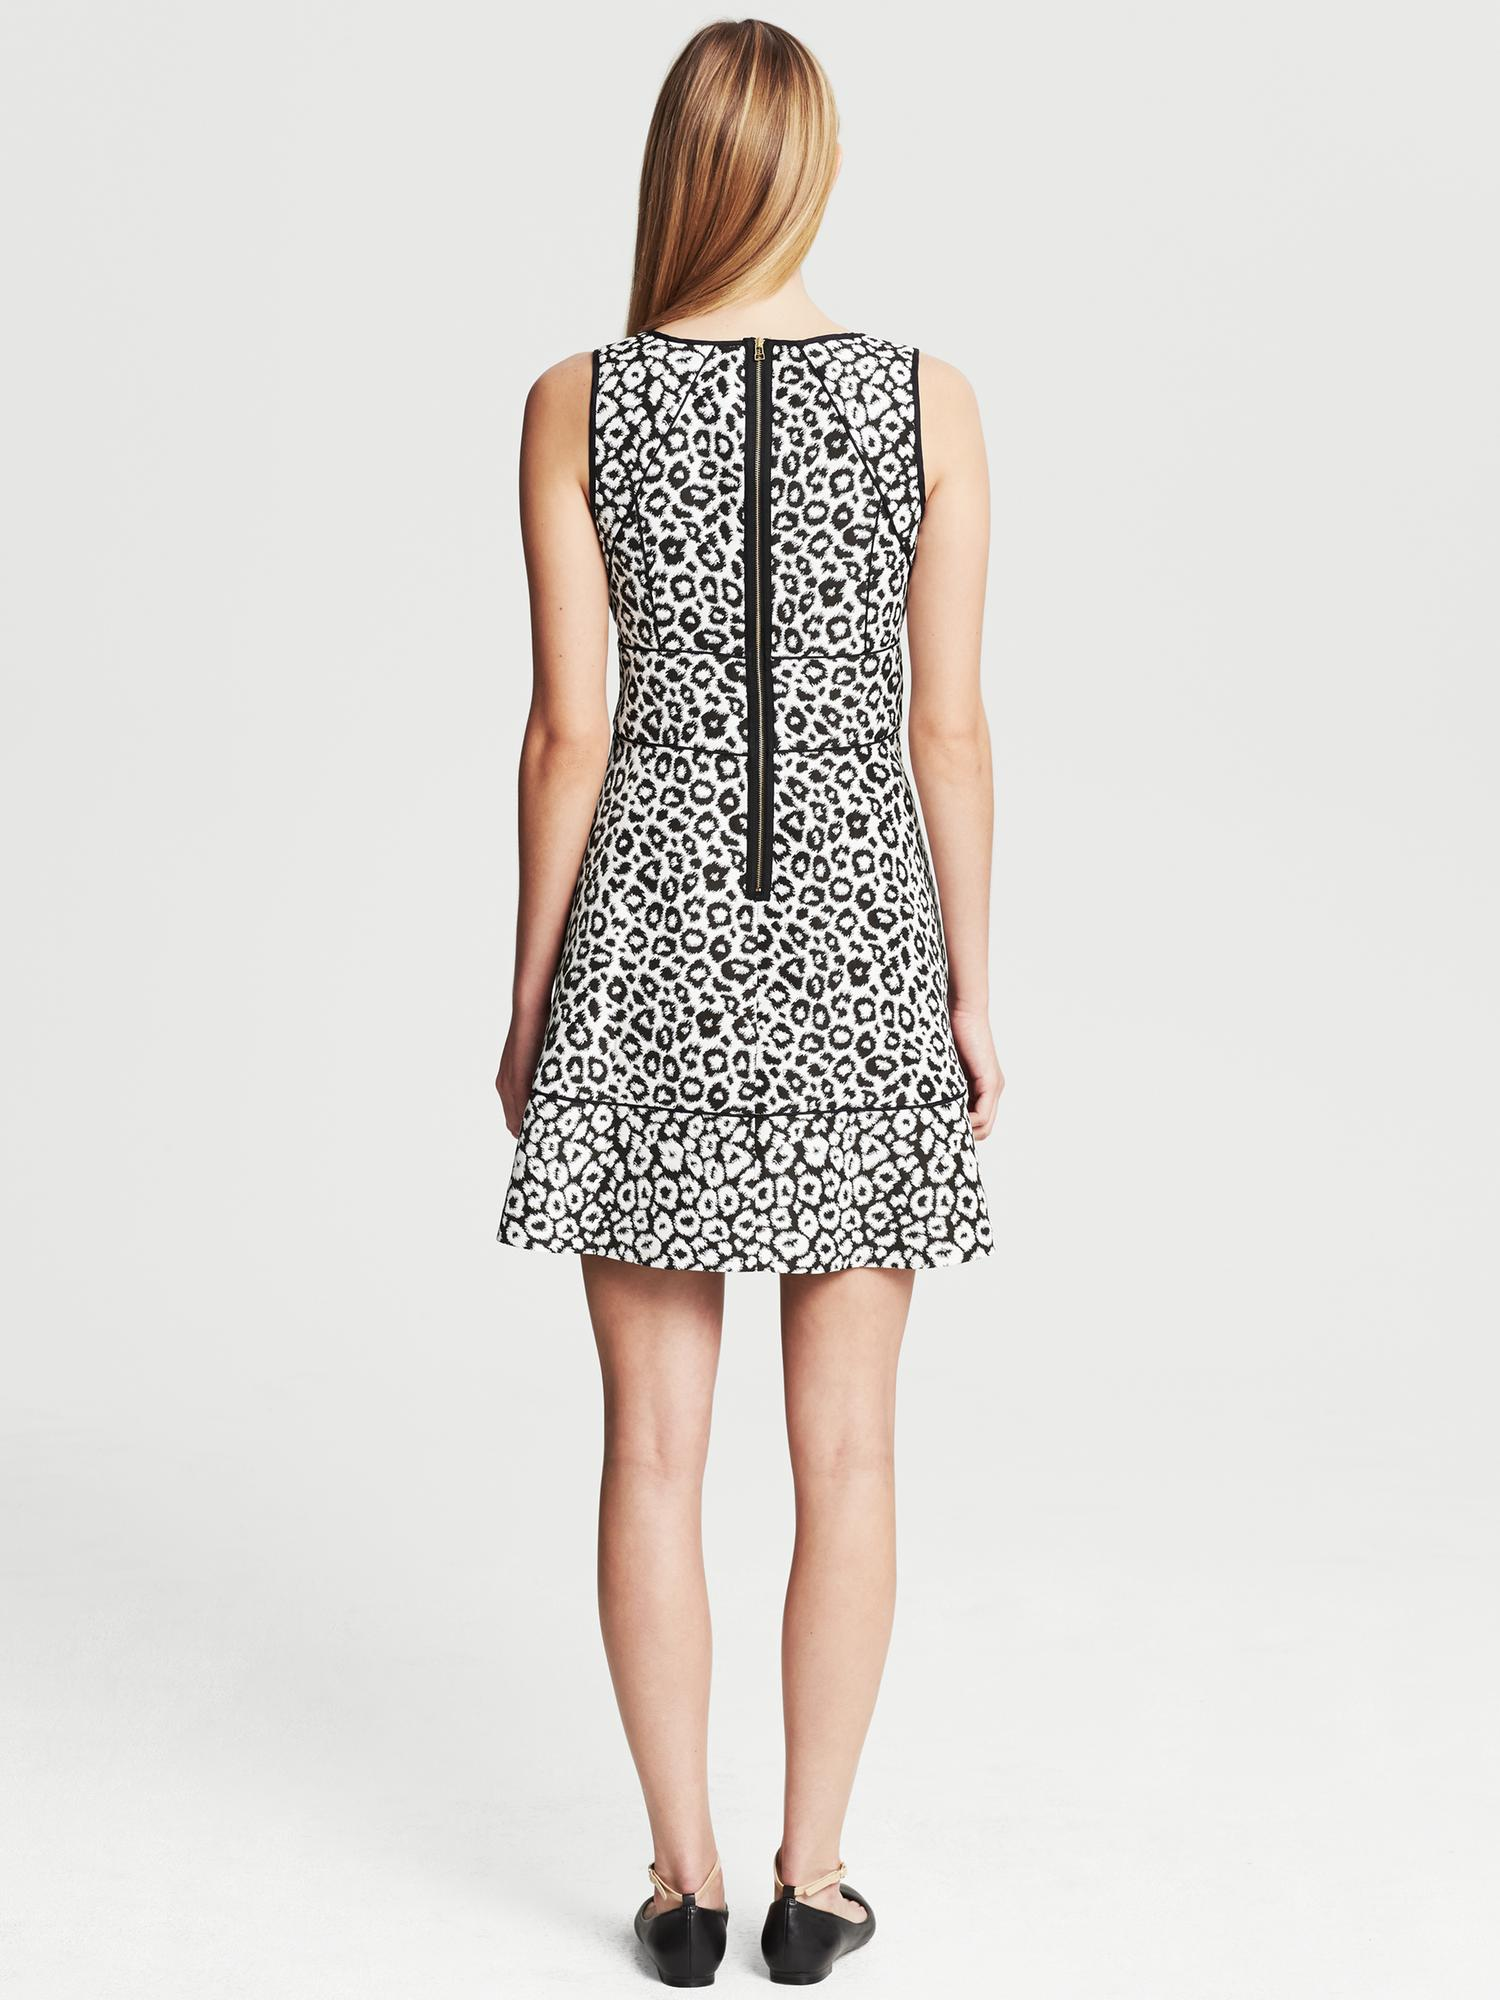 Banana Republic Leopard Jacquard Fit And Flare Dress Black